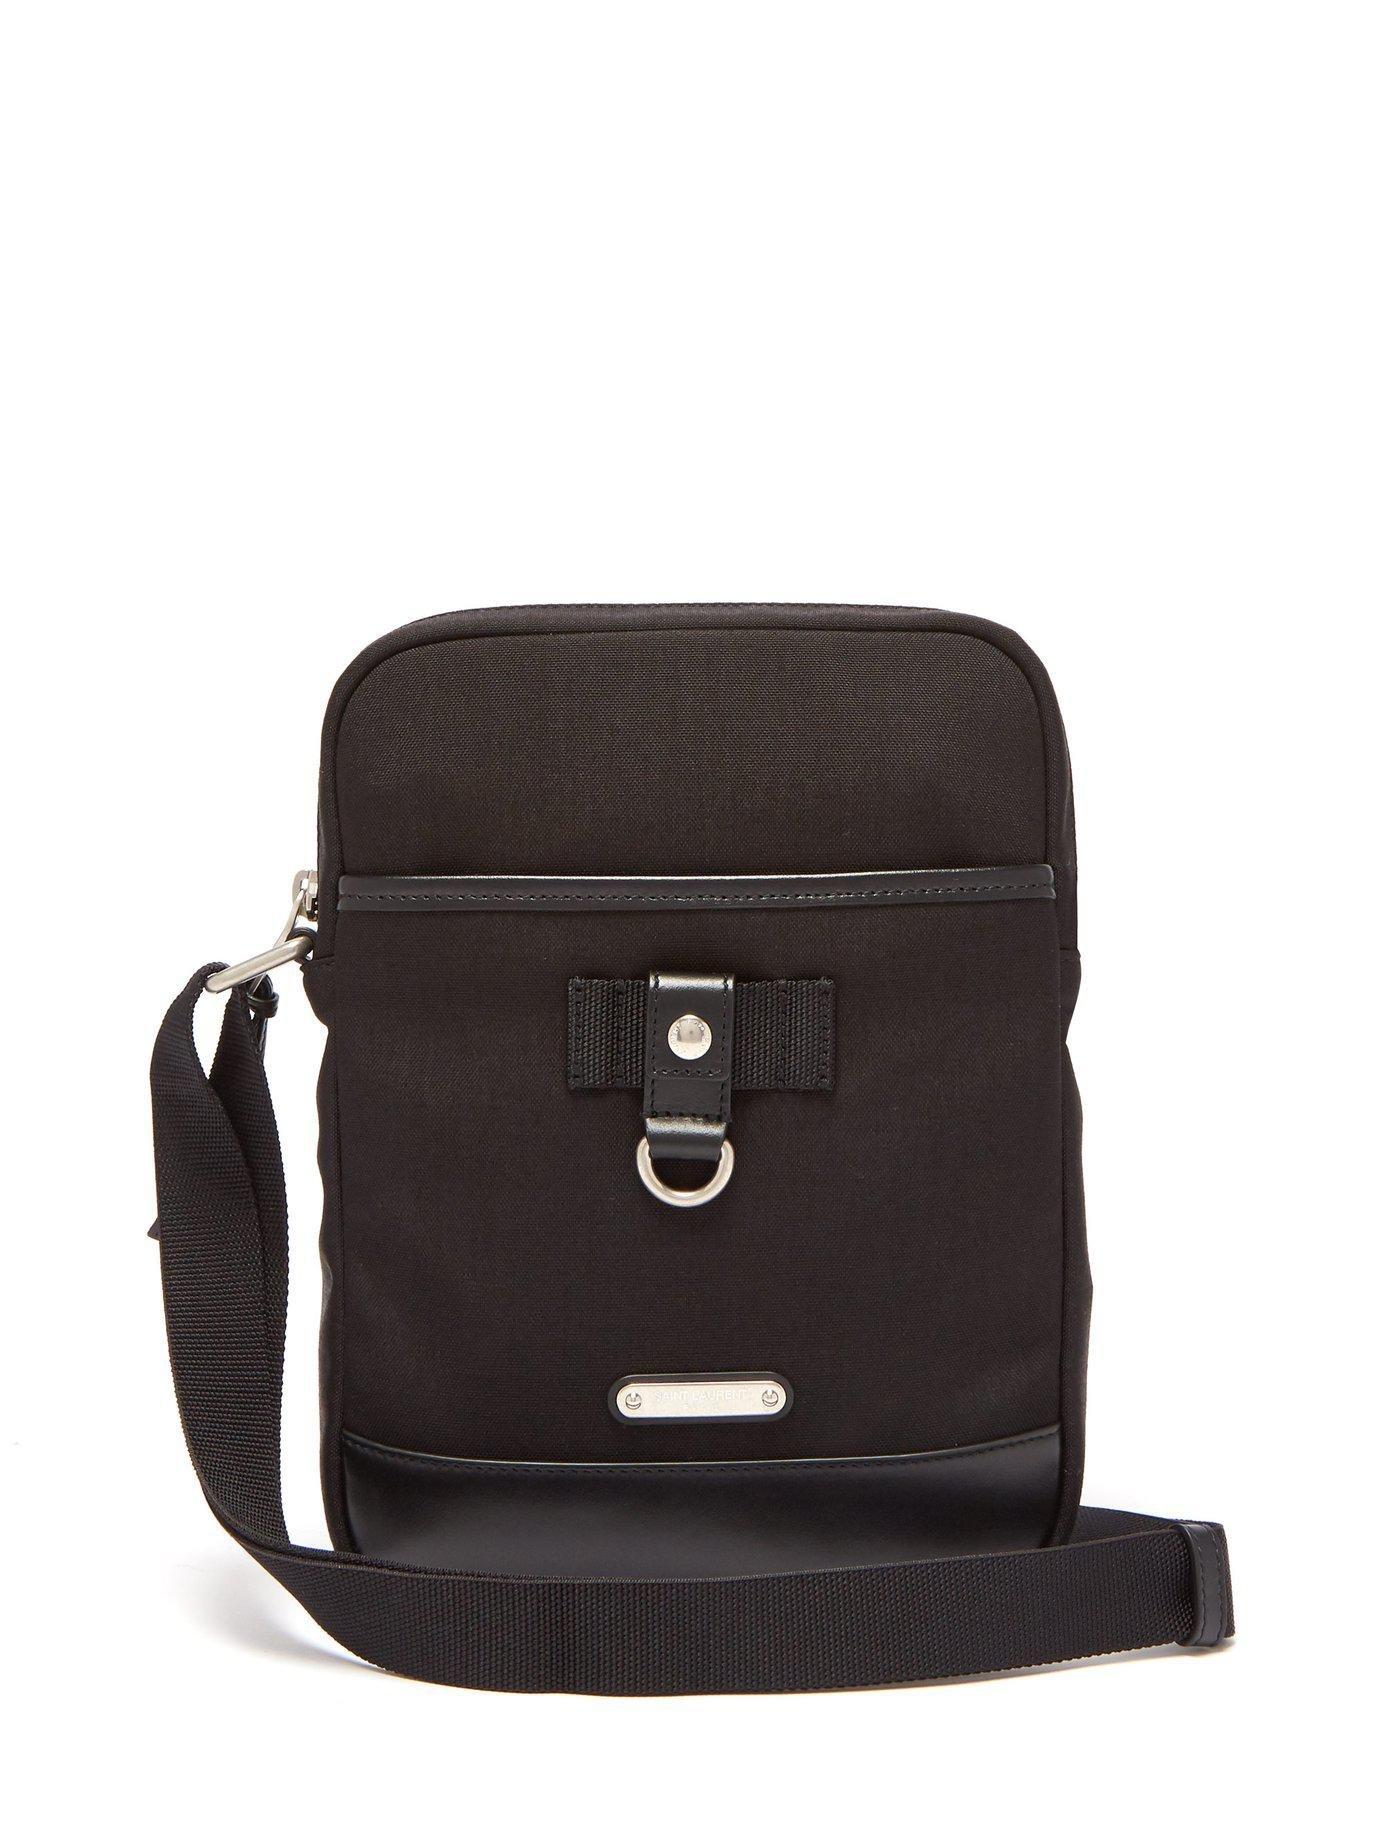 c9b77134e6c0 Lyst - Saint Laurent Rivington Canvas Cross Body Bag in Black for ...